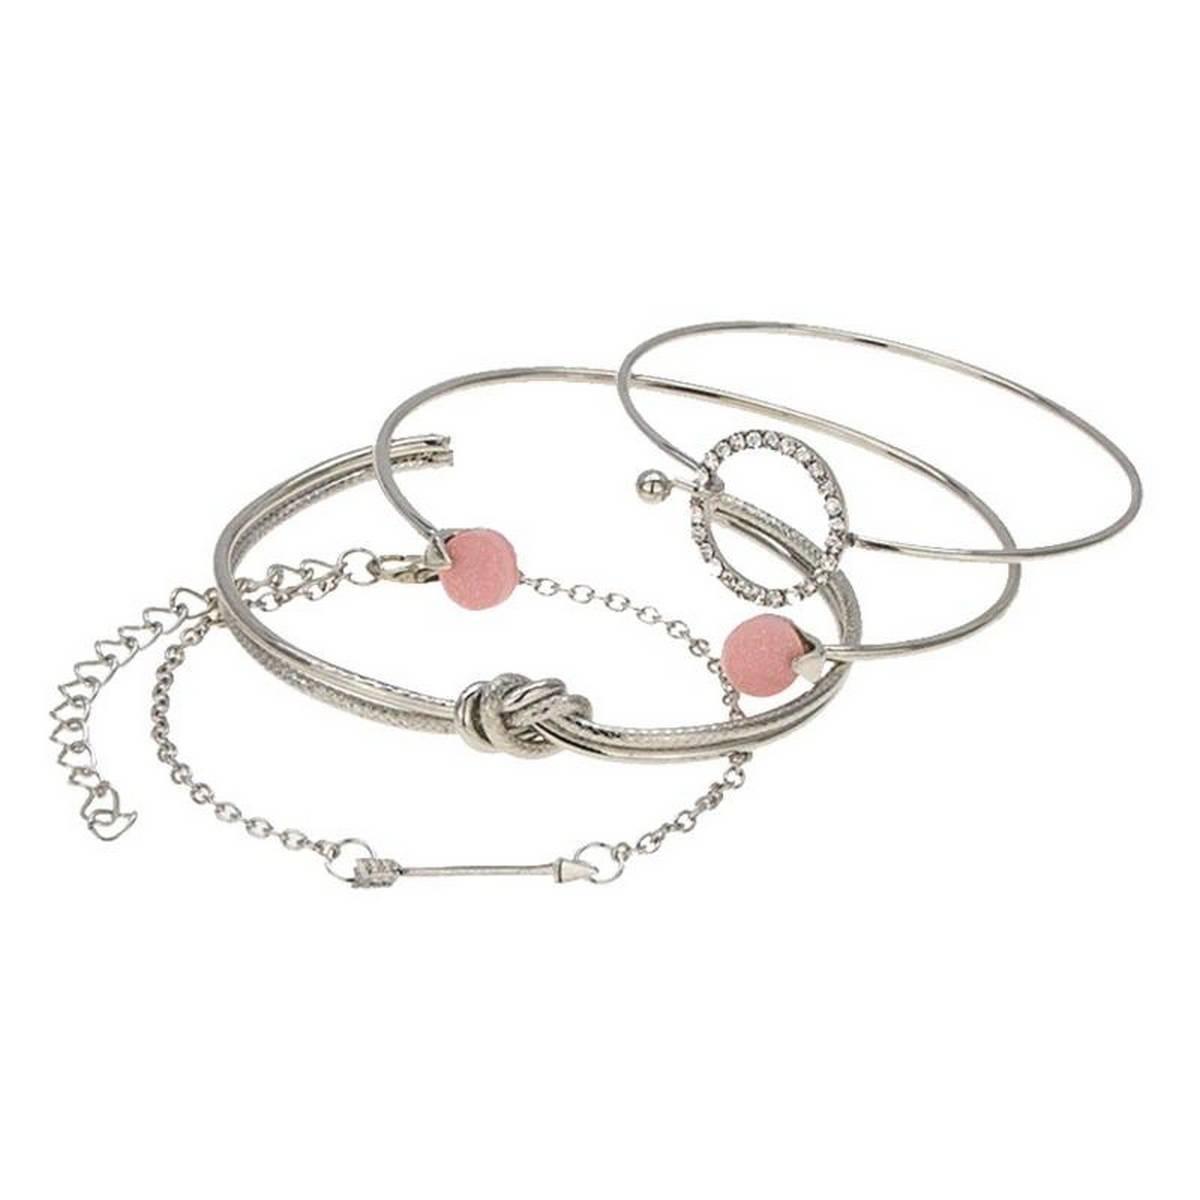 Cute Romantic Bracelet Set For Women Jewelry Bohemian Gold Silver Geometric Metal Arrow Shiny Rhinestones Woman Bracelet